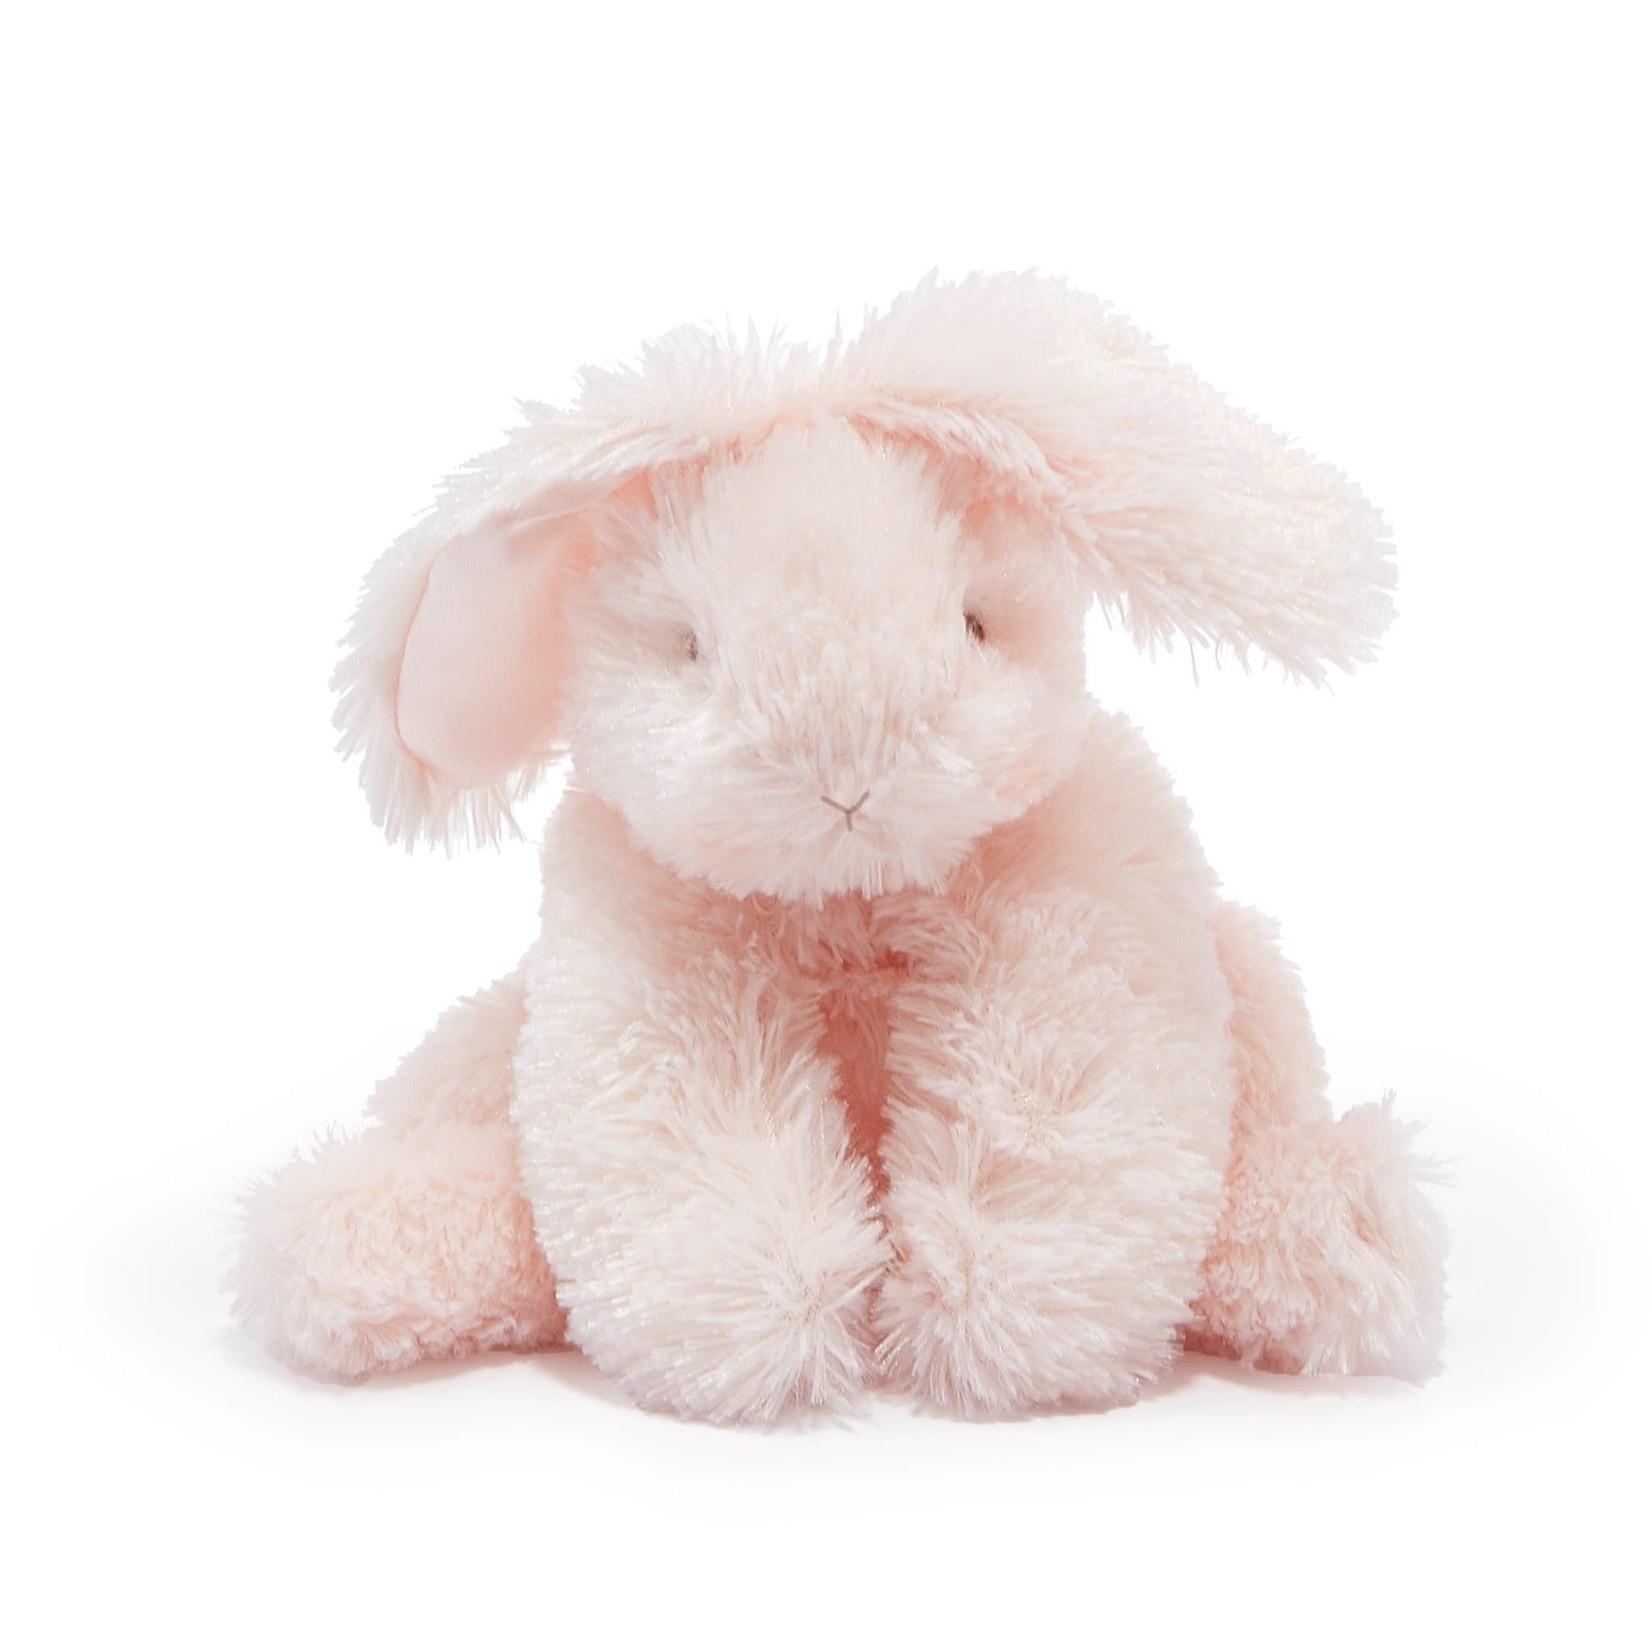 Bunnies By the Bay Blossom Floppy Bun Stuffed Animal